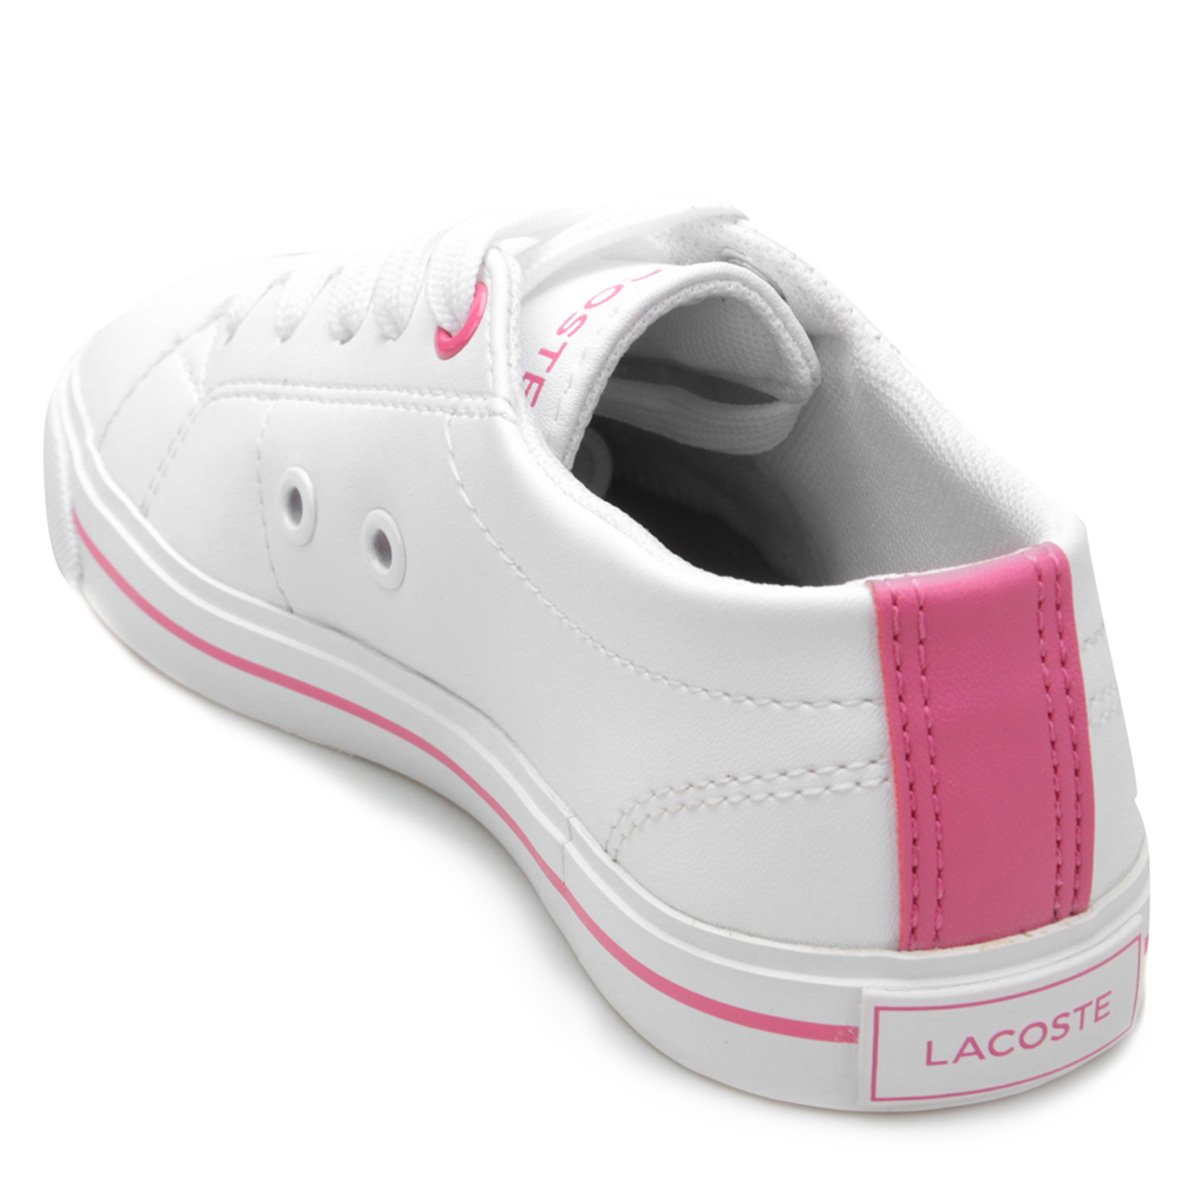 Tênis Infantil Lacoste Riberac - Branco e Rosa - Compre Agora   Zattini 86925b5b93